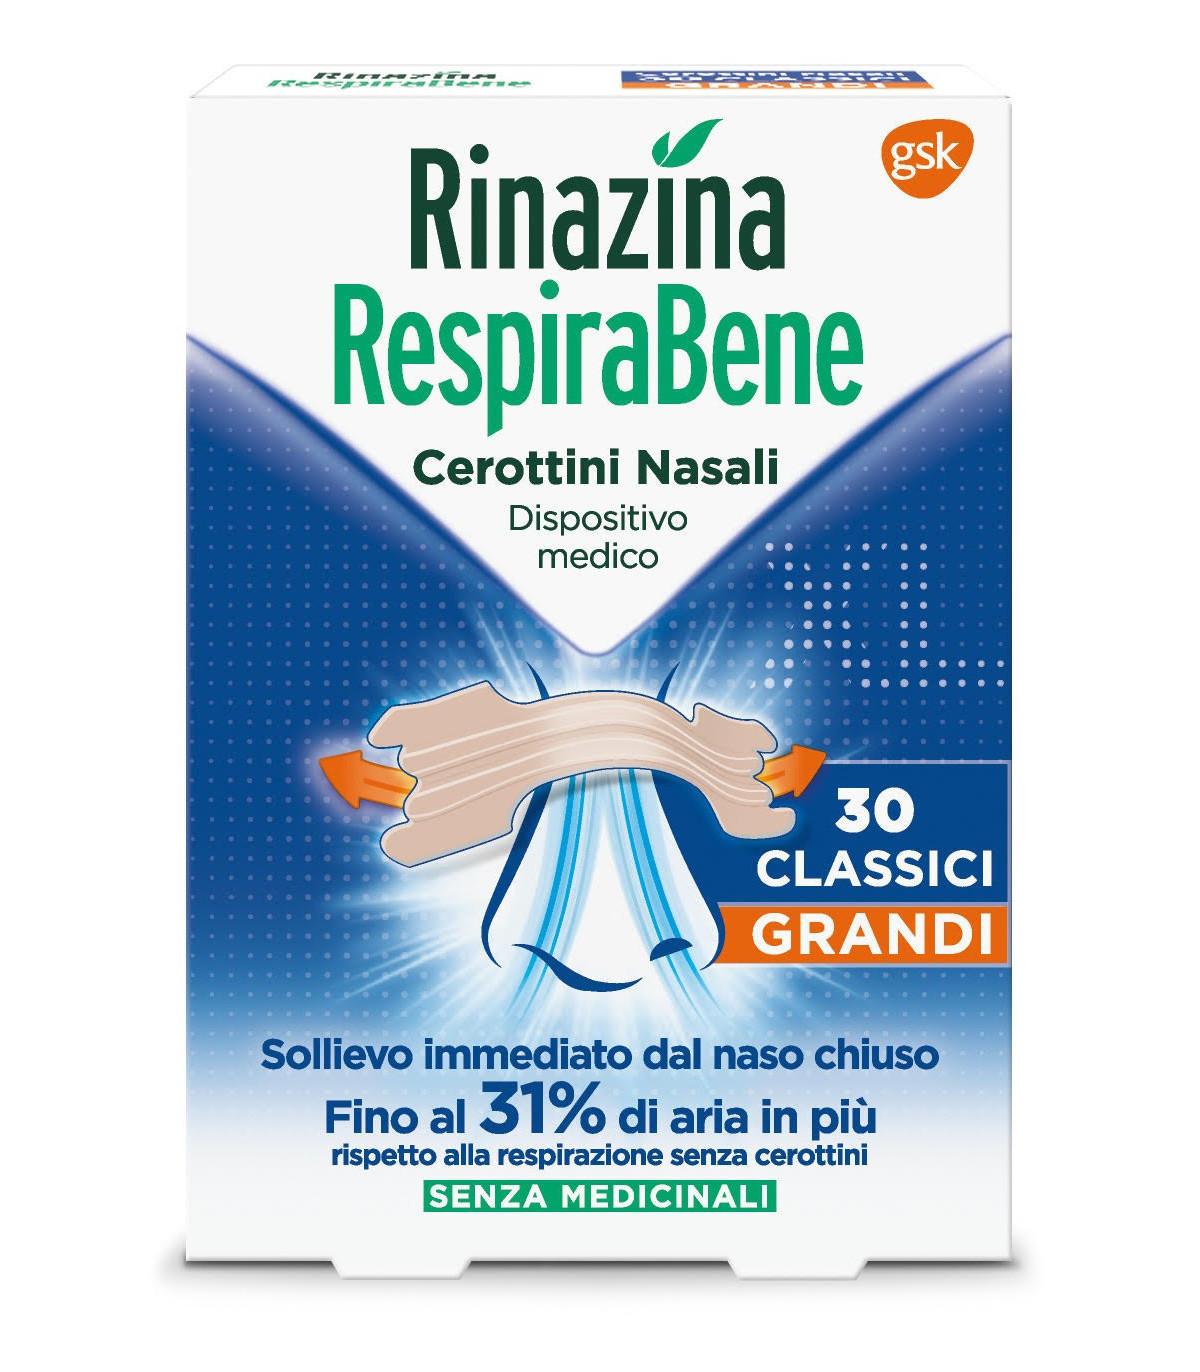 RINAZINA RESPIRABENE 30 cerotti classici